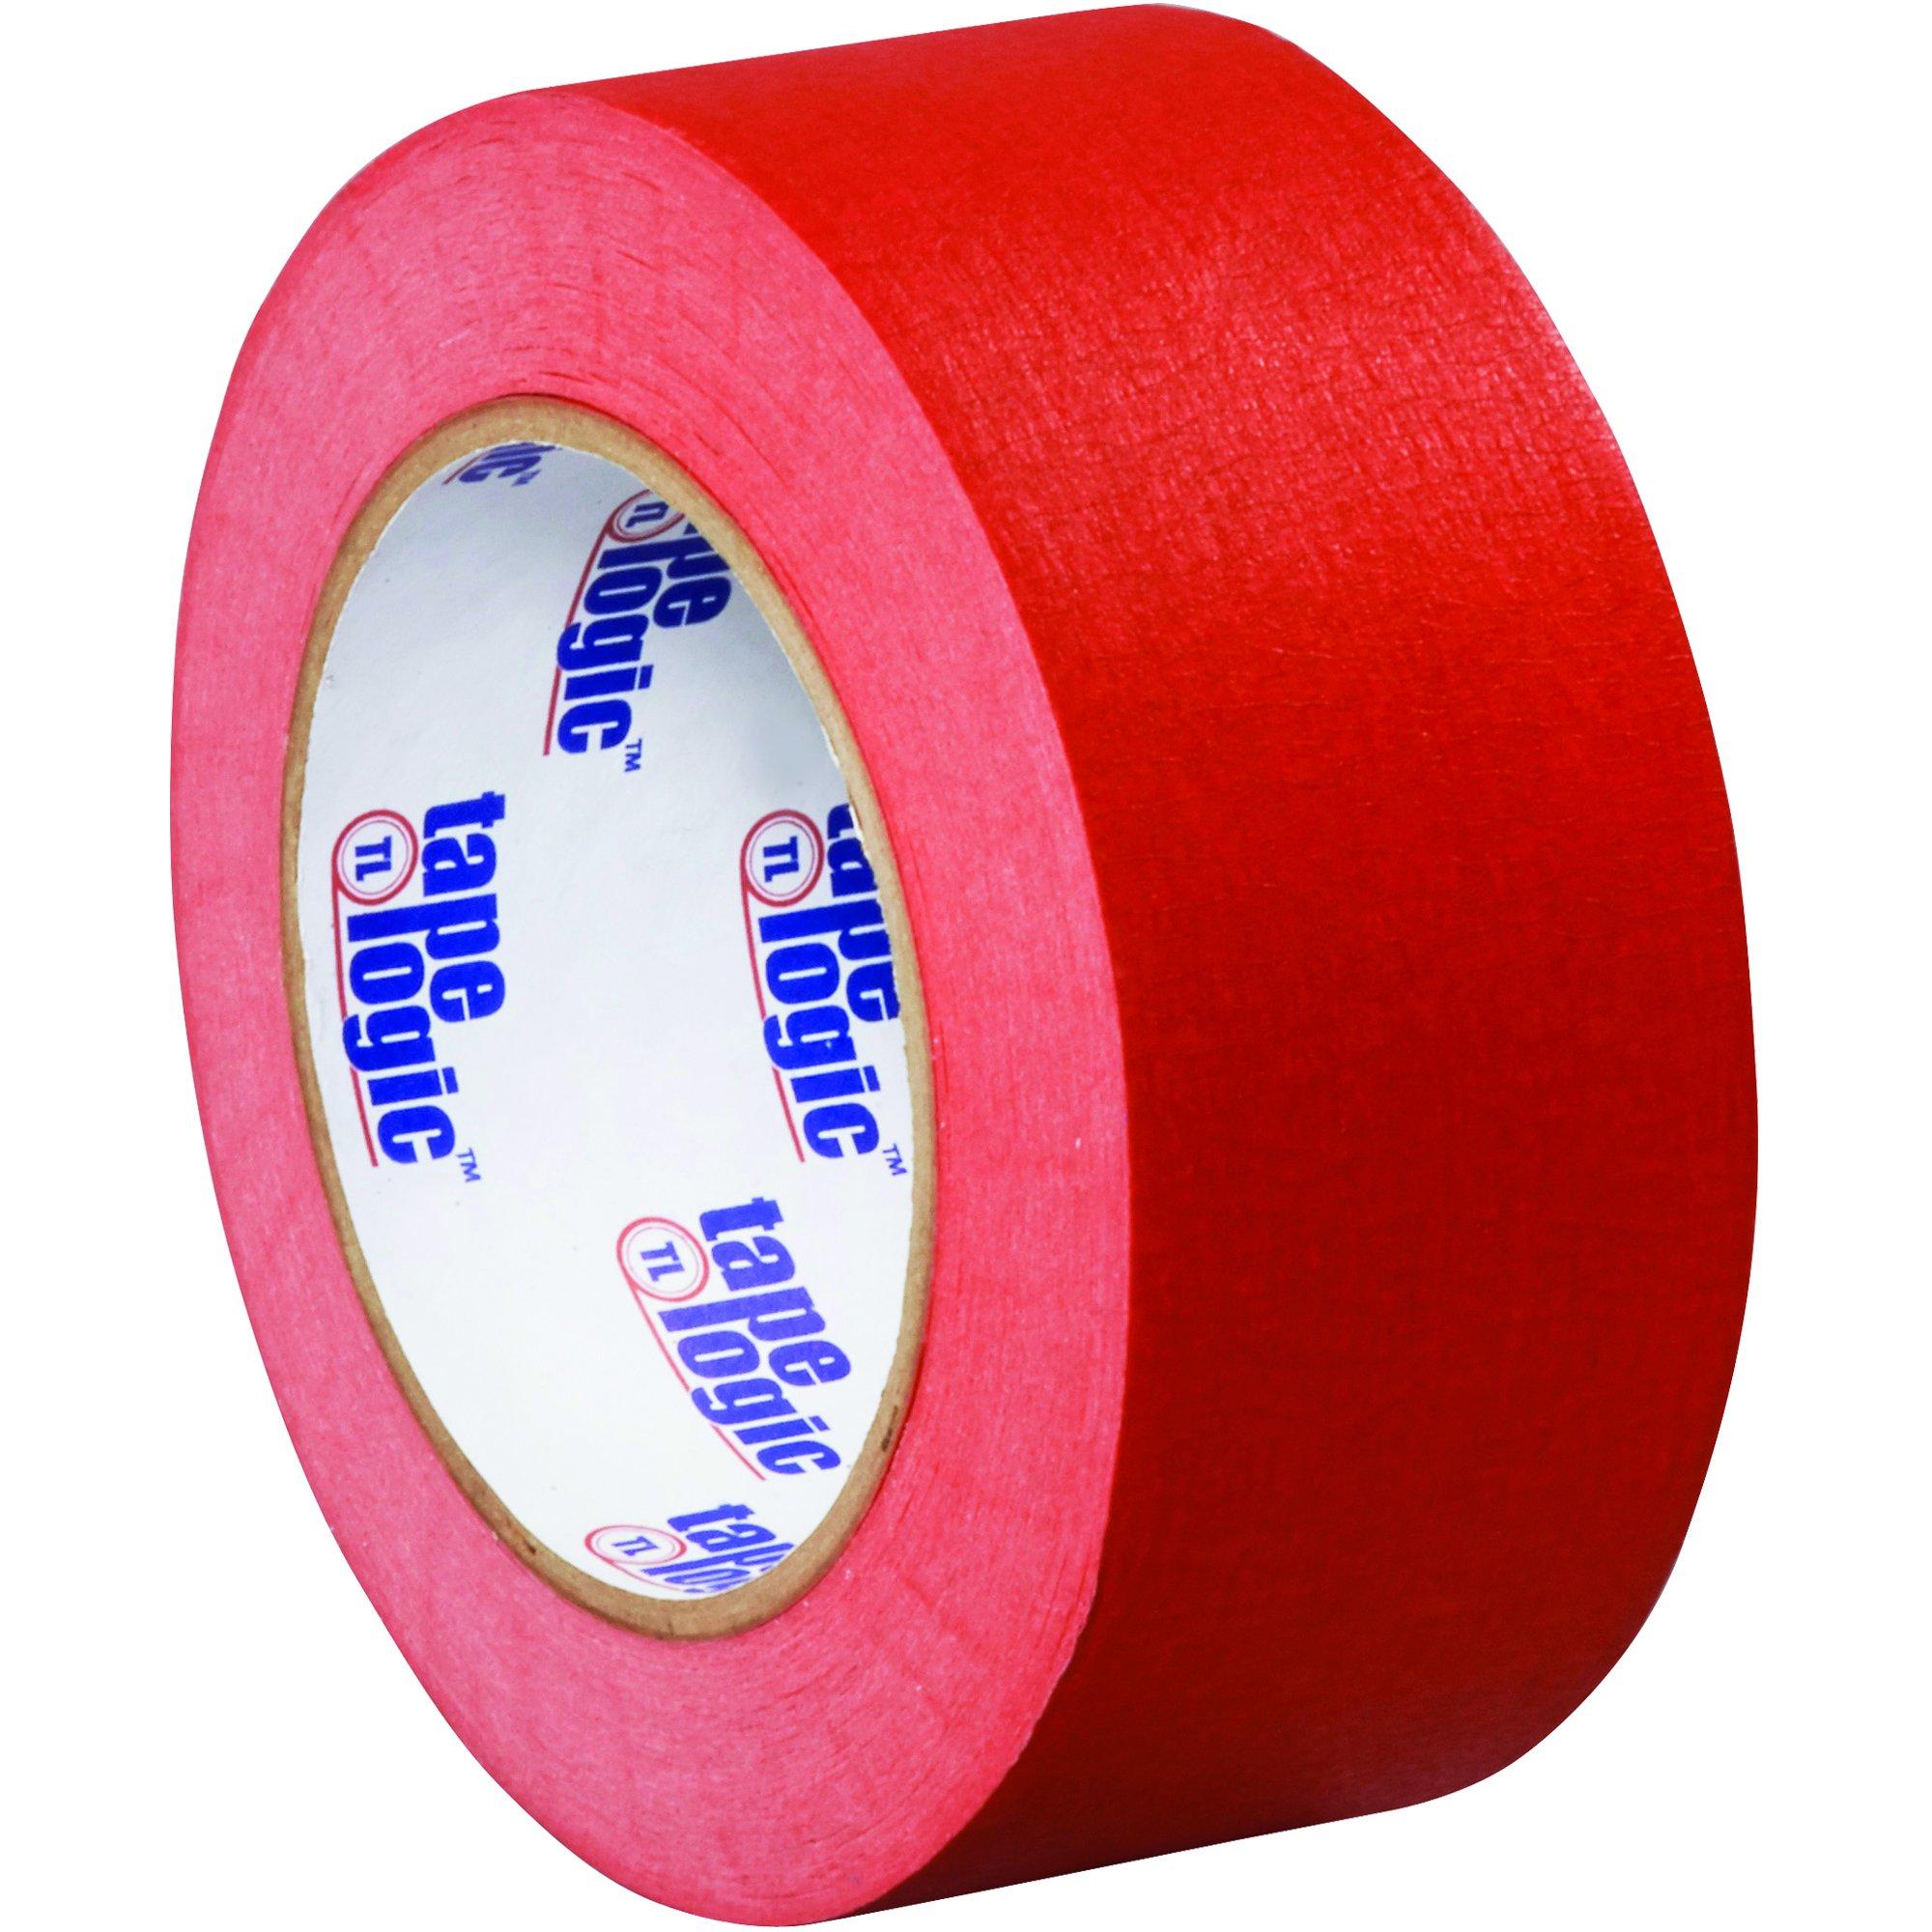 BOX USA BT93700312PKR Tape Logic Masking Tape, 2'' x 60 yd., Red (Pack of 12)